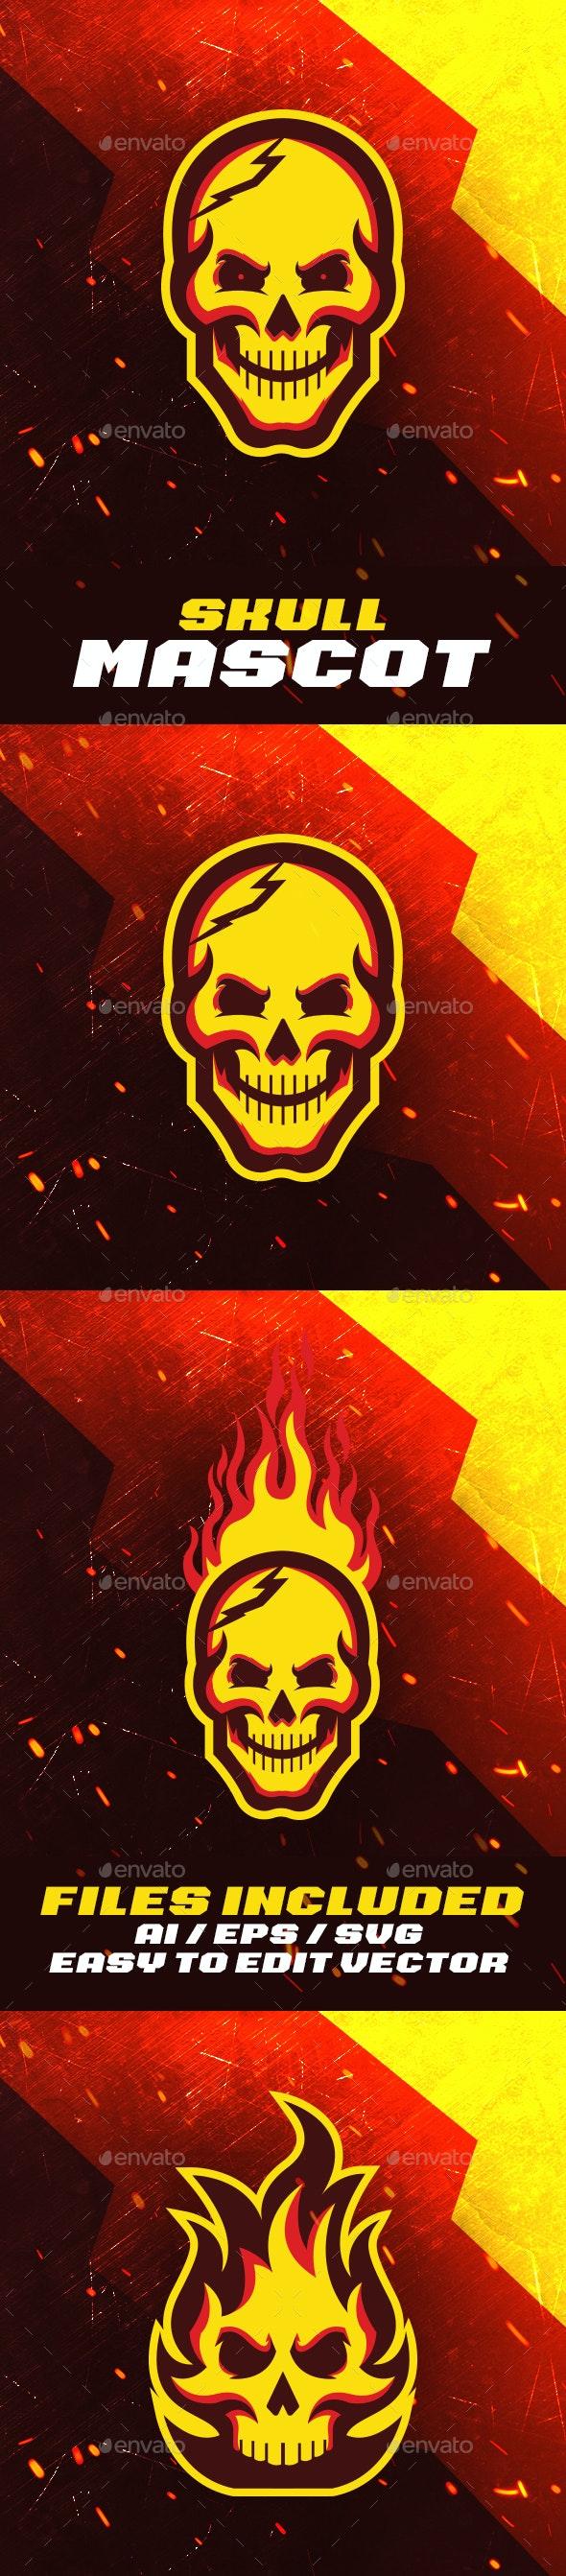 Skull Mascot Logo - Monsters Characters